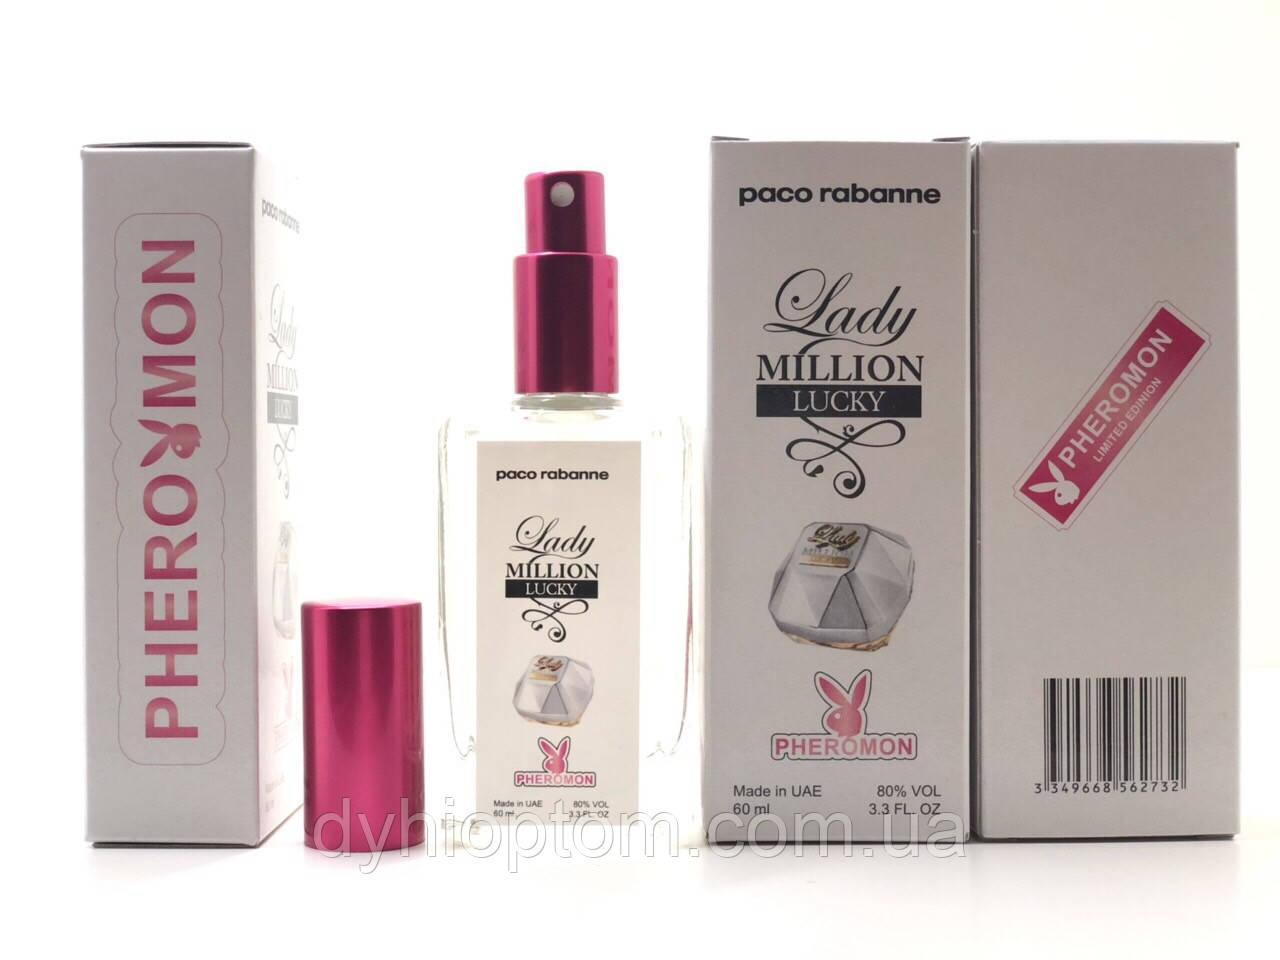 Женский парфюм Paco Rabanne Lady Million Lucky 60 ml